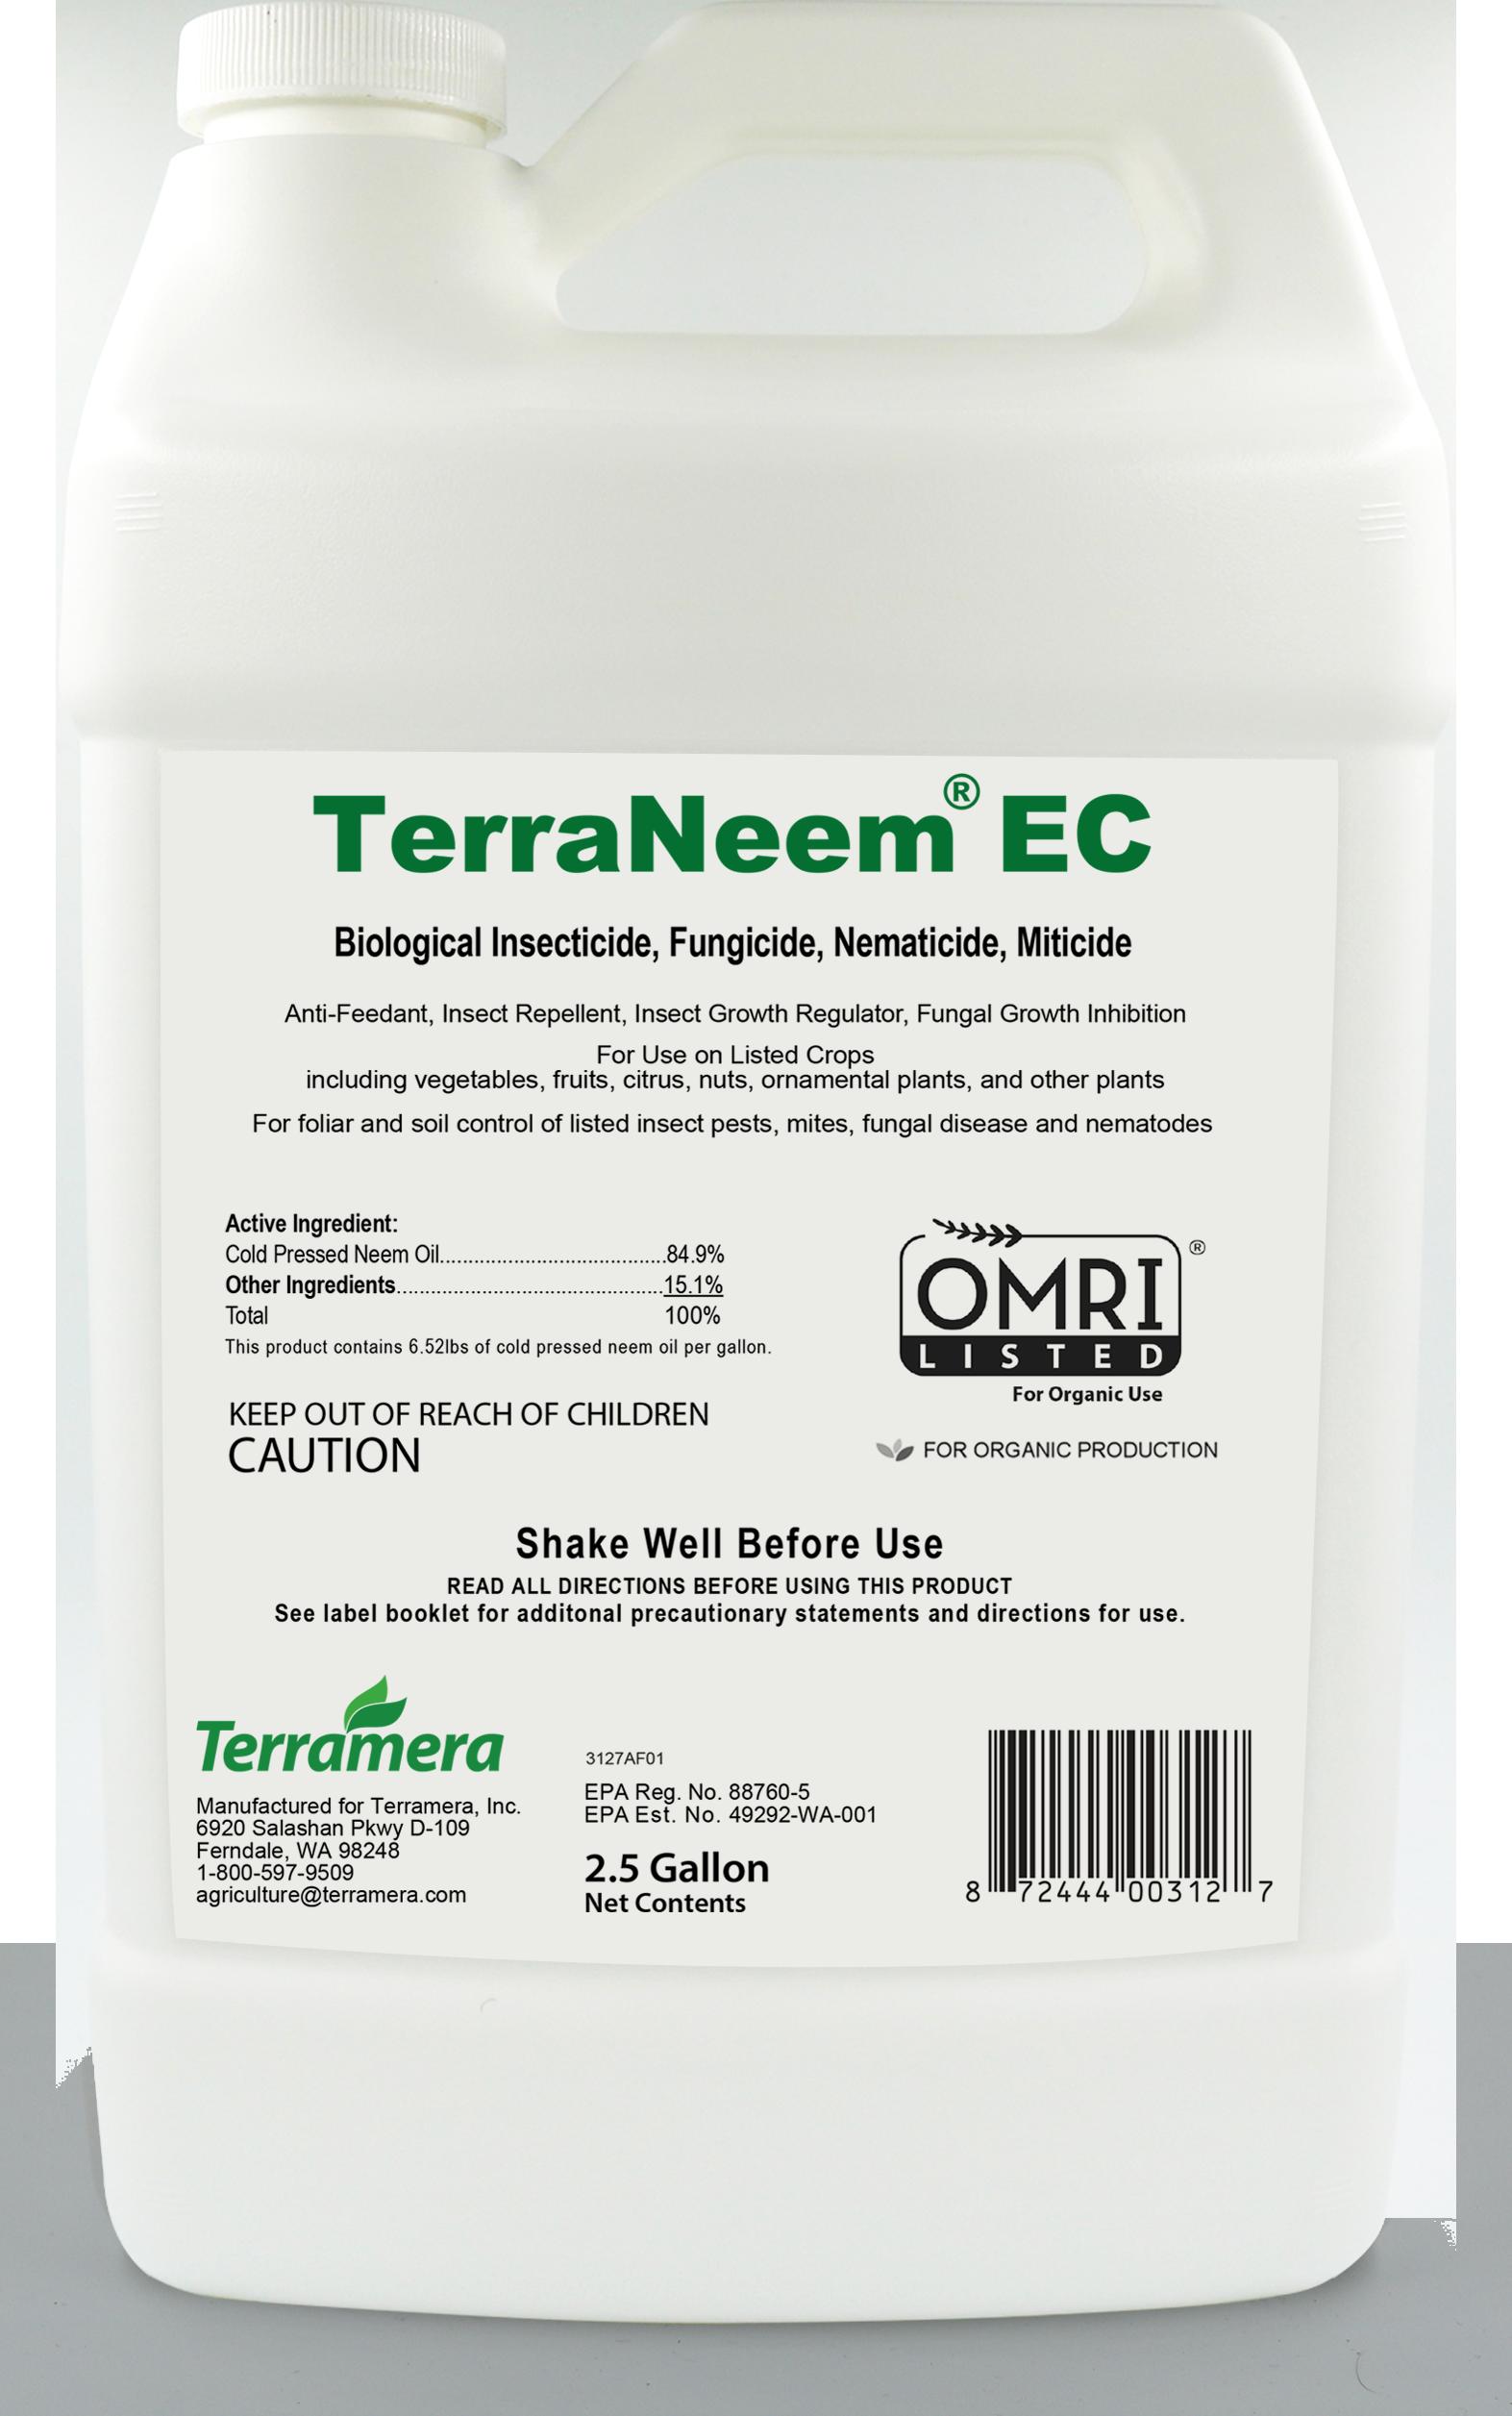 TerraNeem®EC Product Image